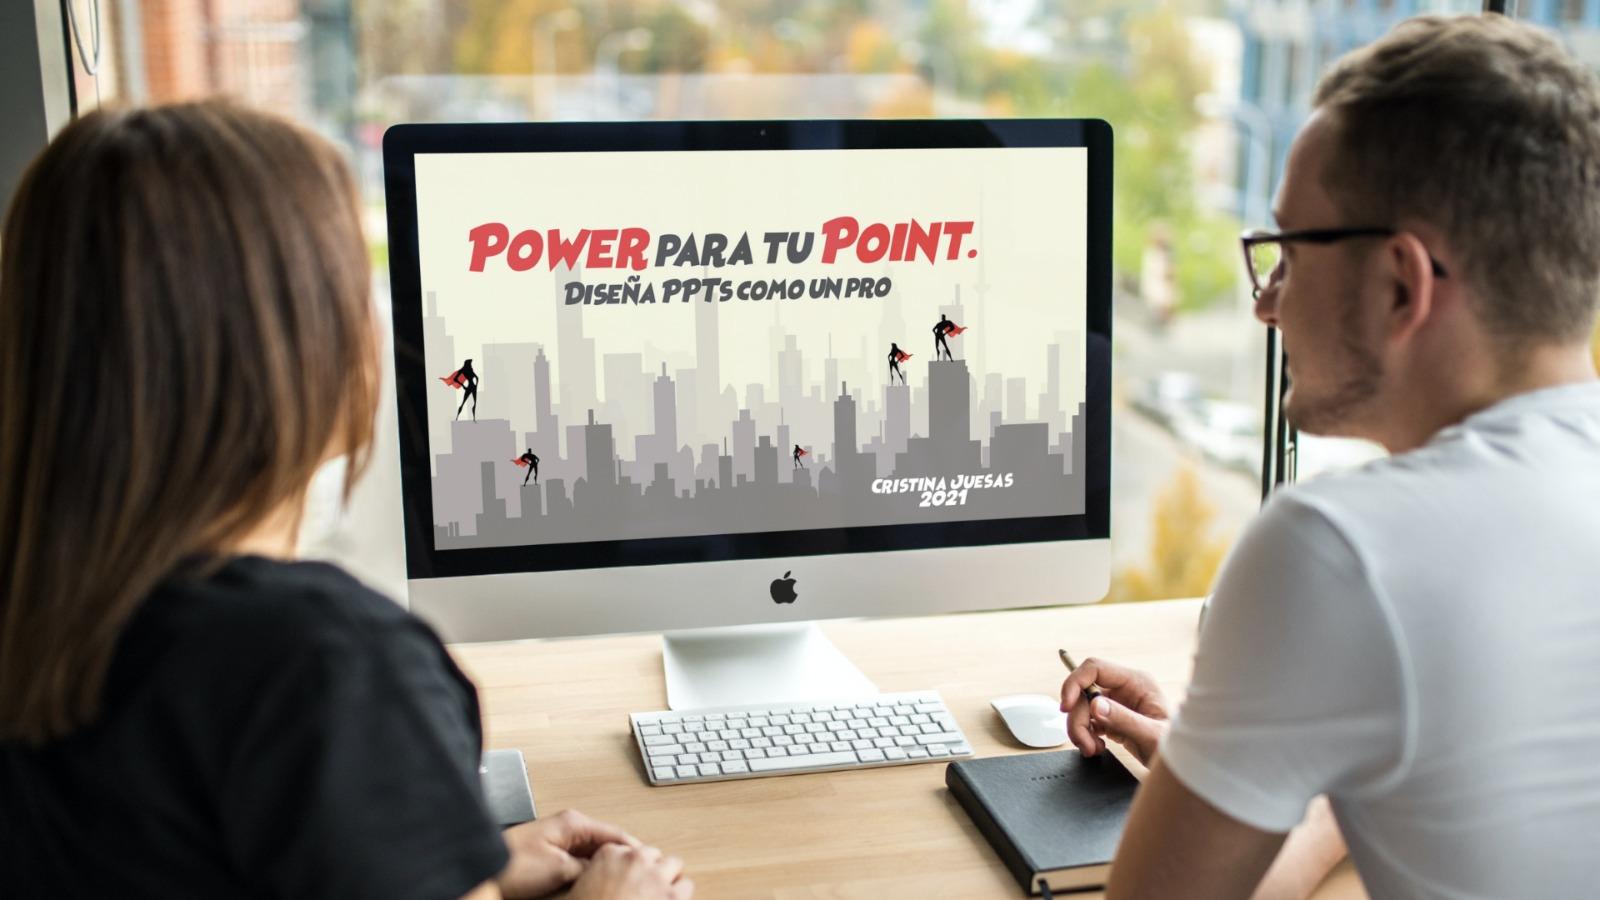 Power para tu point